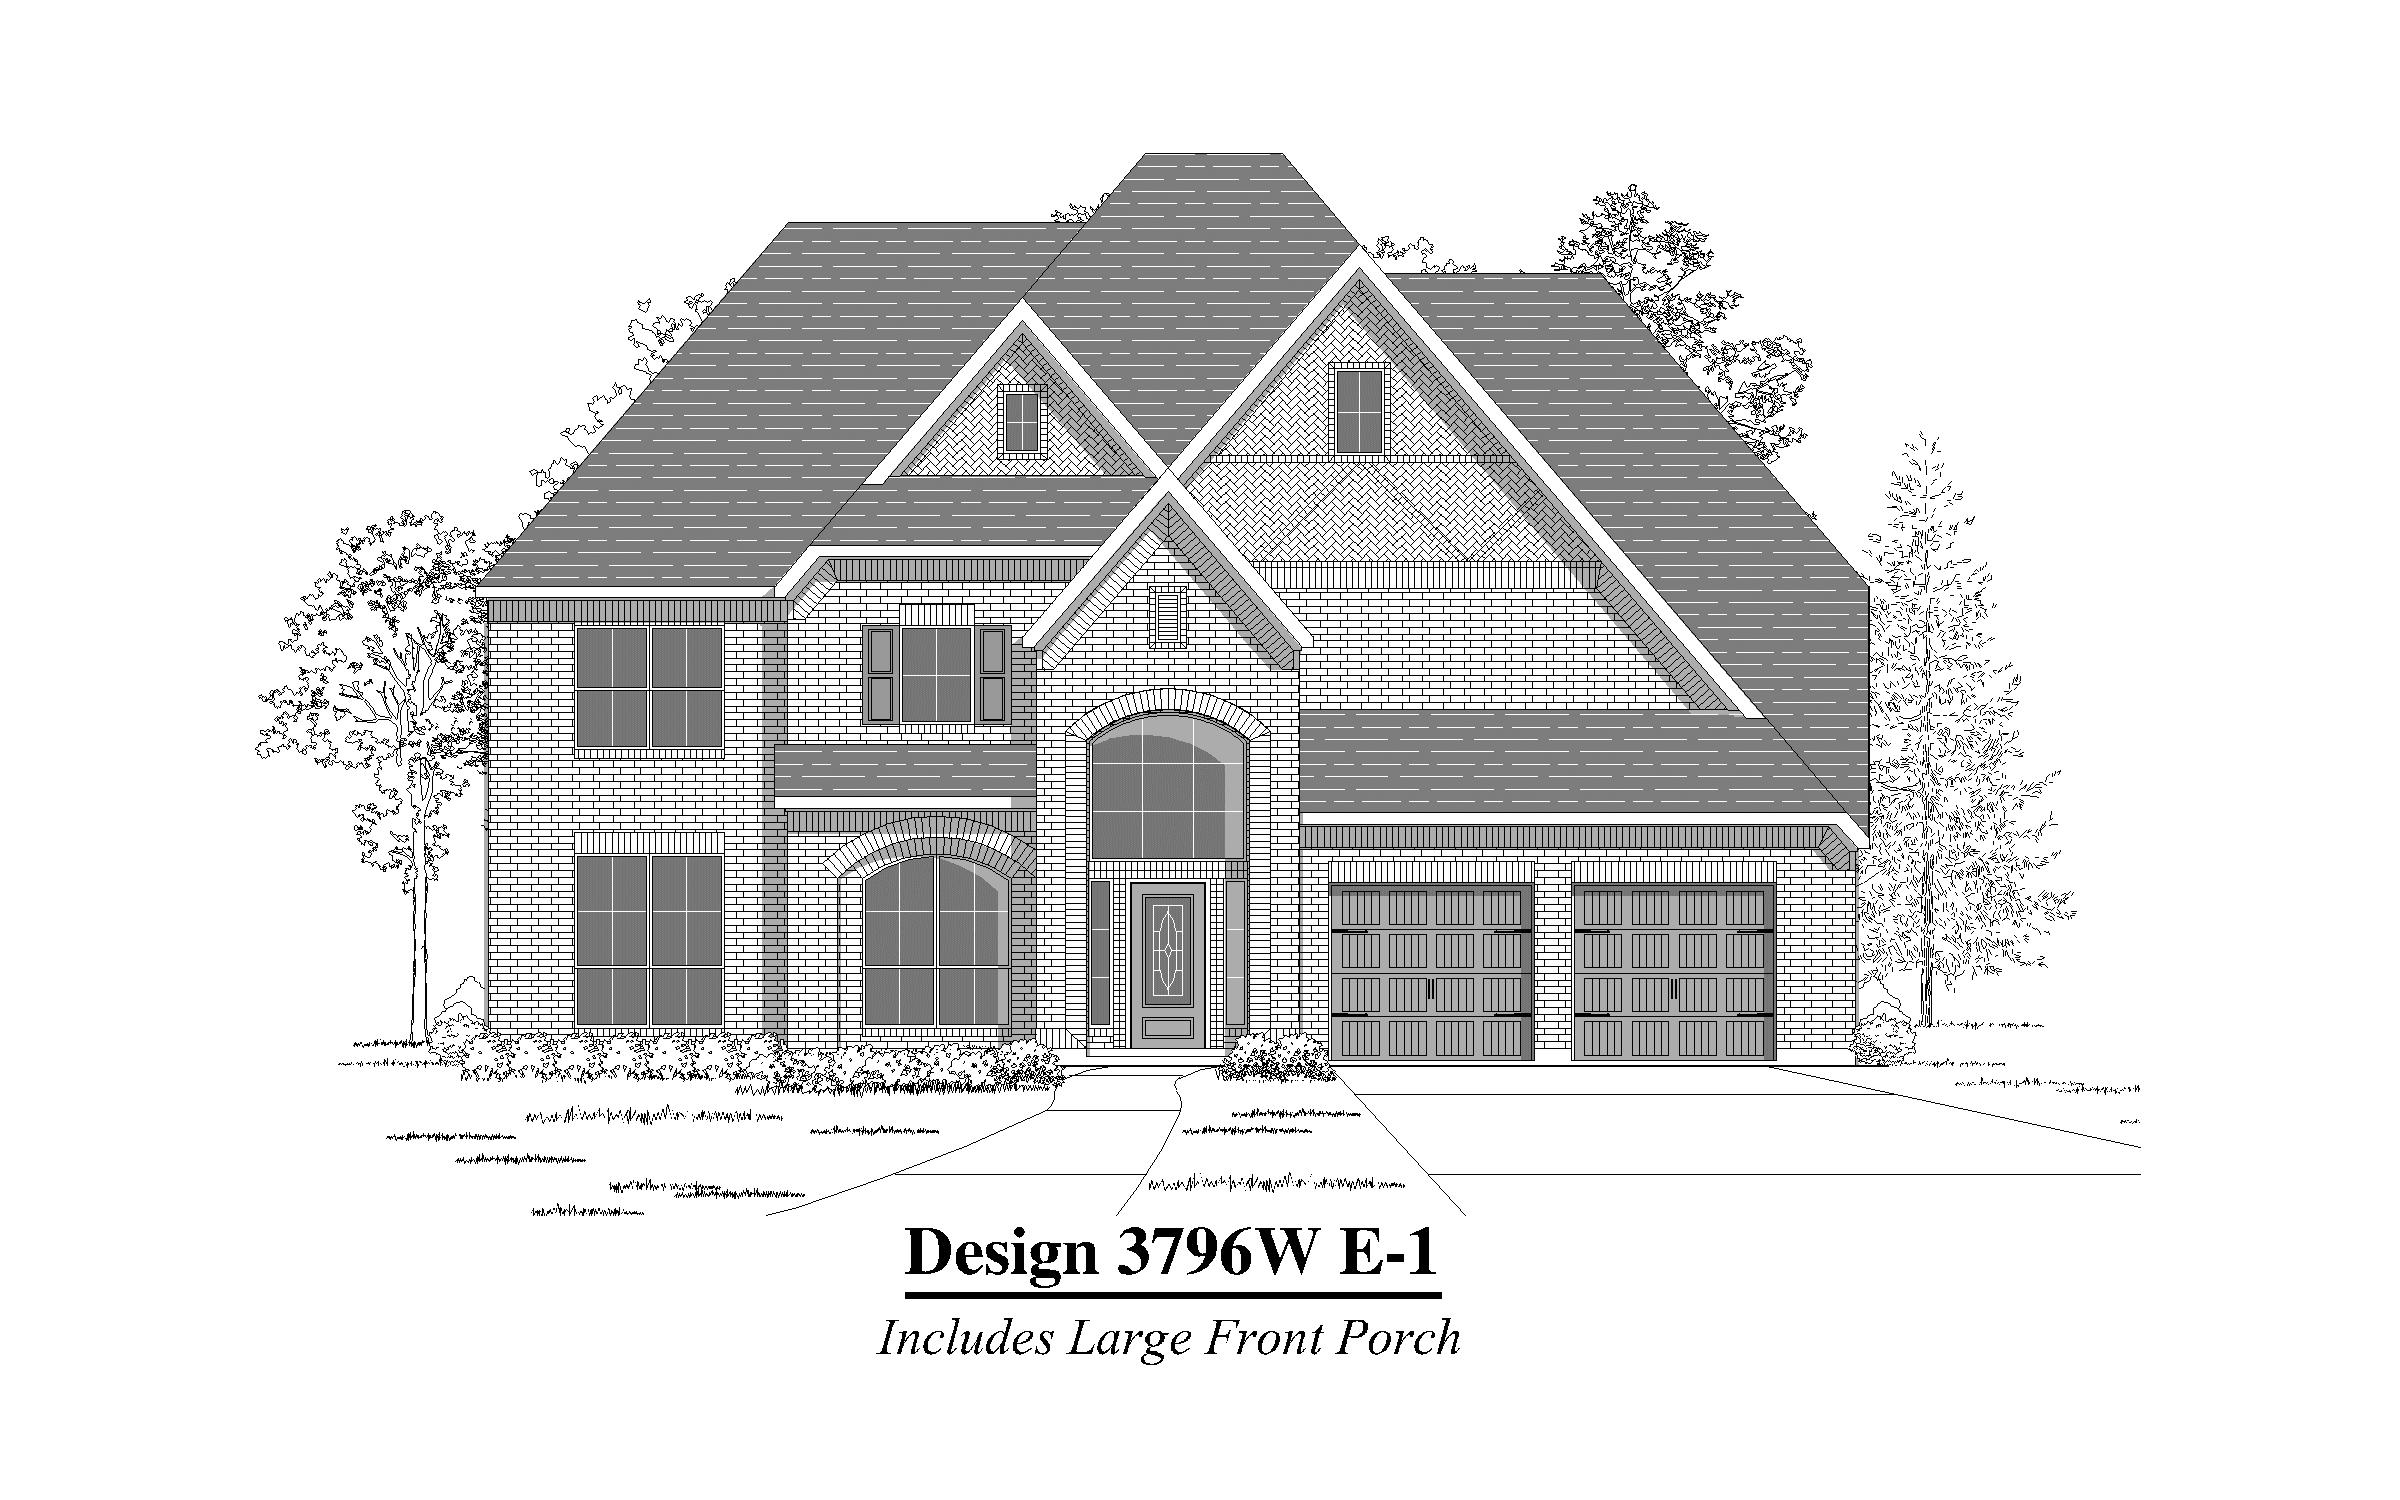 Single Family for Sale at Veranda 65' - 3796w 1242 Mystic River Lane Rosenberg, Texas 77471 United States